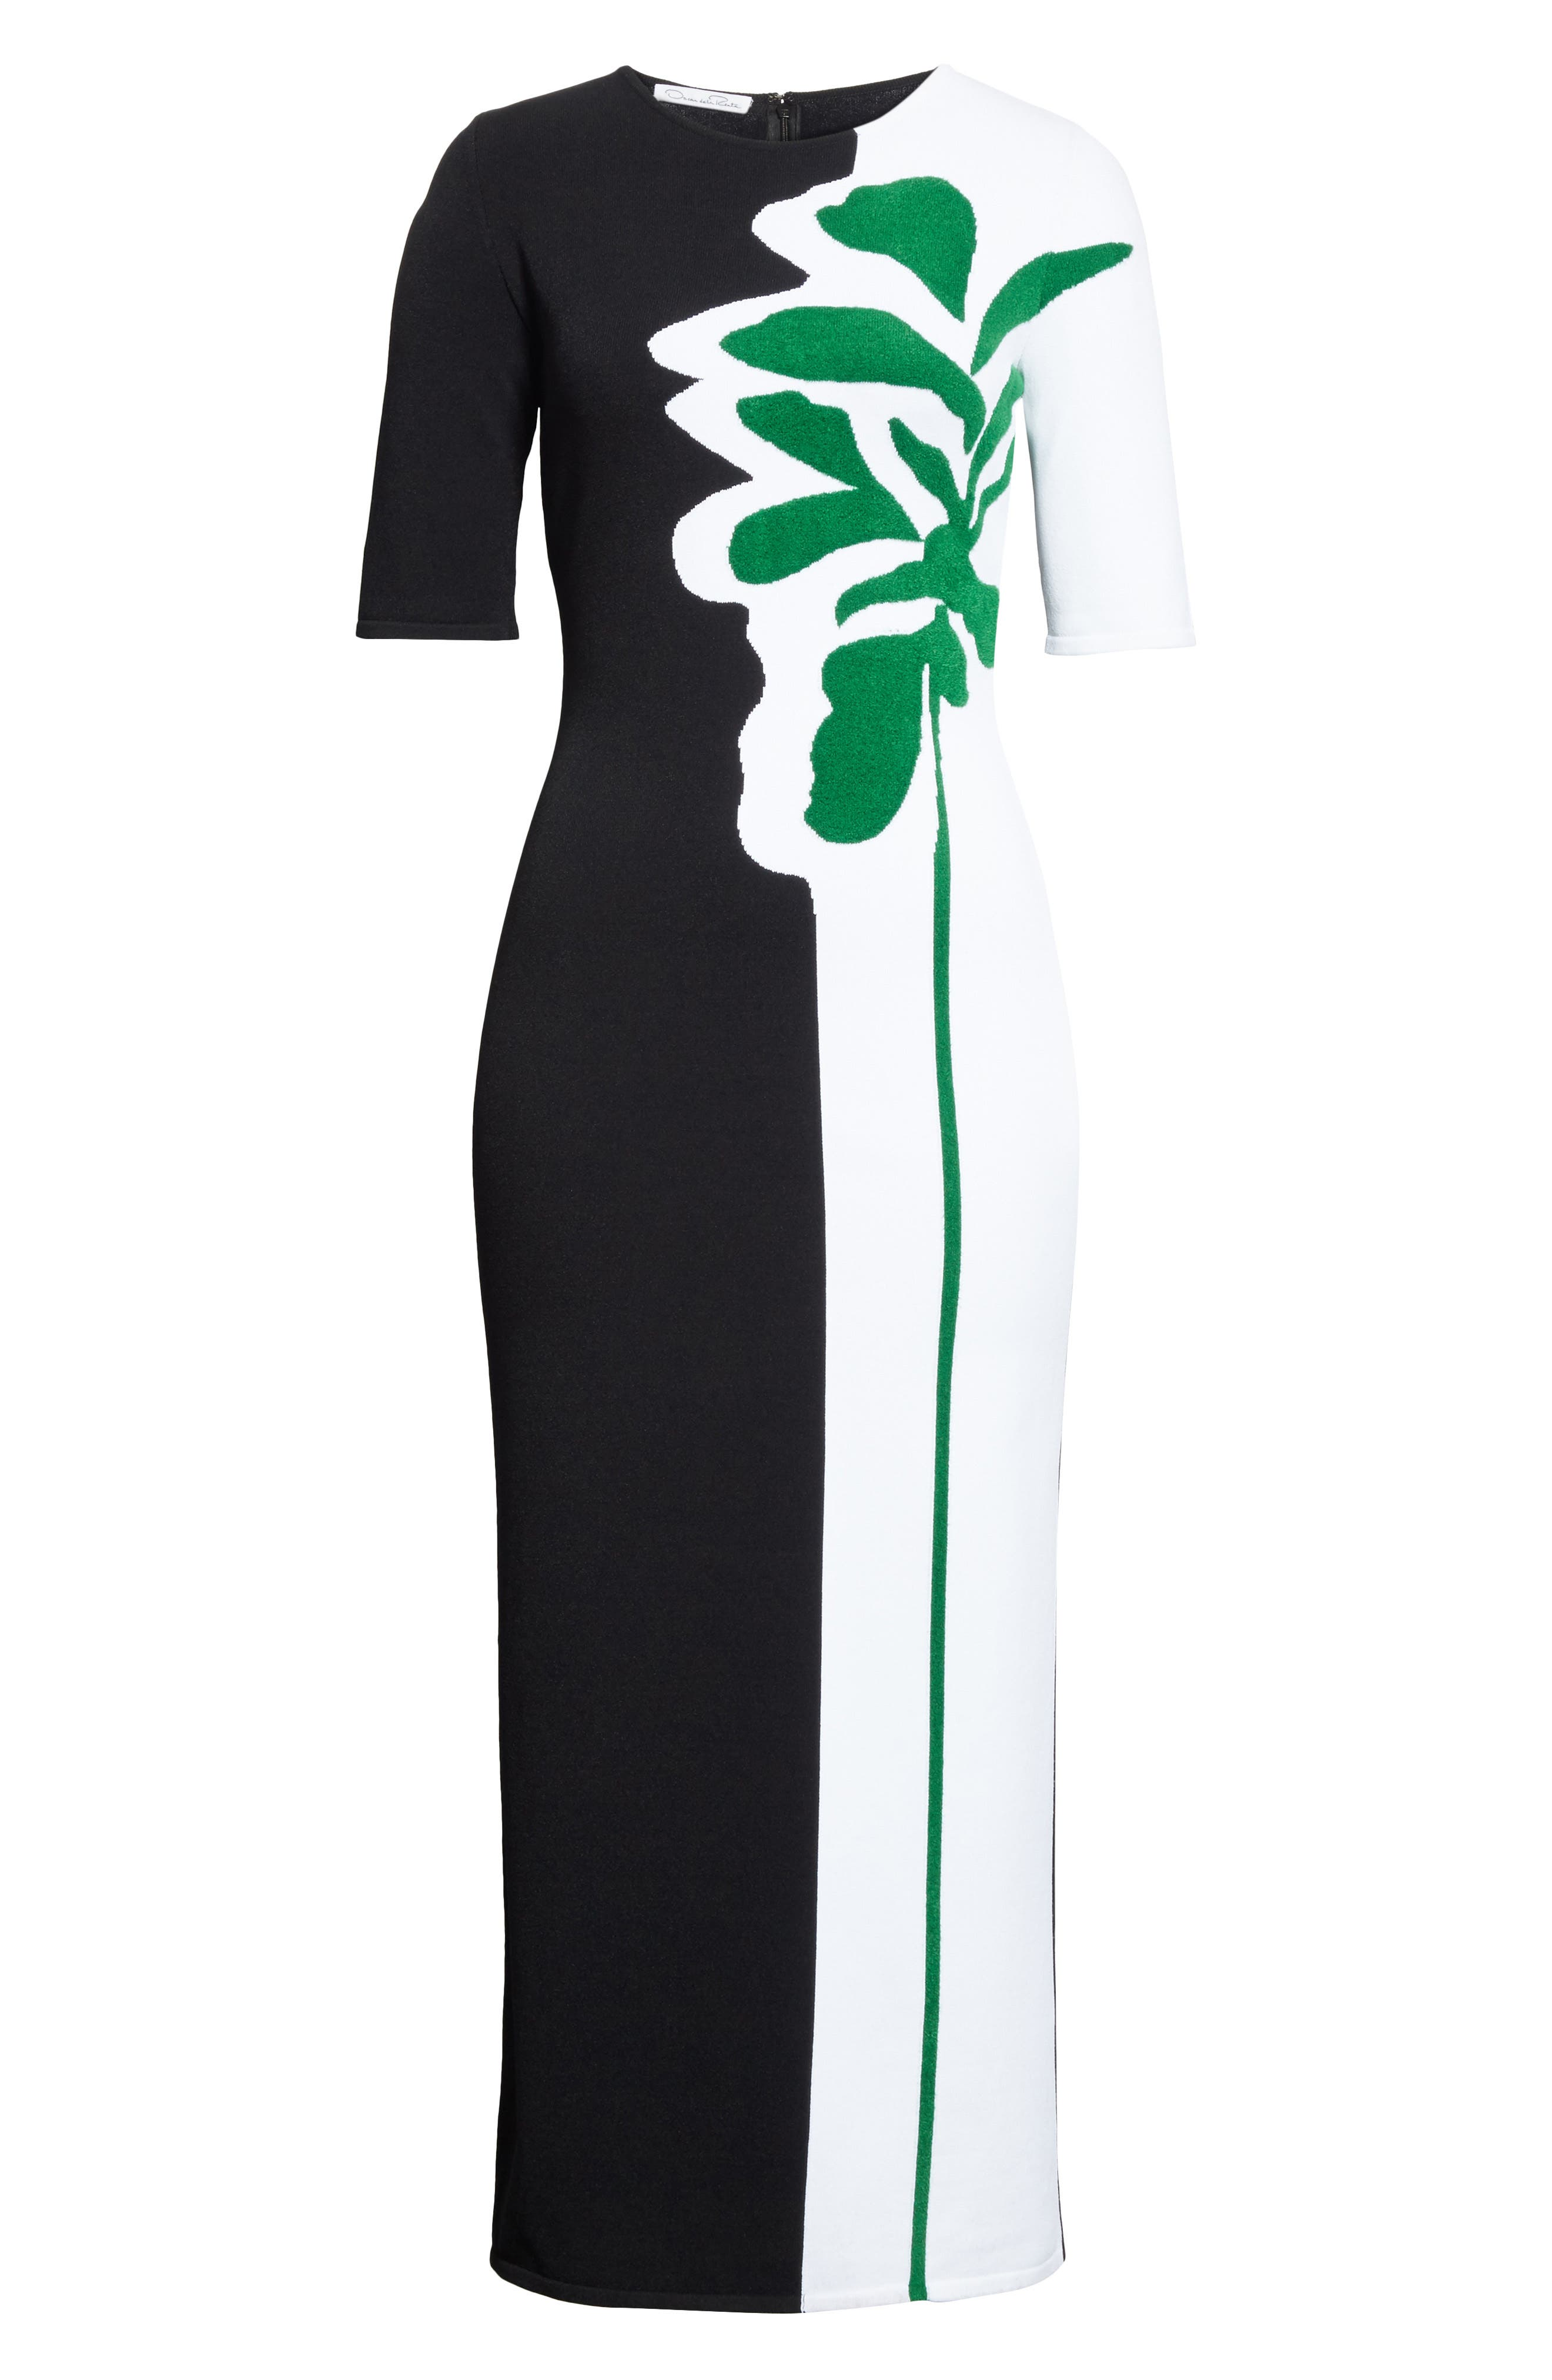 Intarsia Leaf Print Dress,                             Alternate thumbnail 7, color,                             White/ Black/ Evergreen